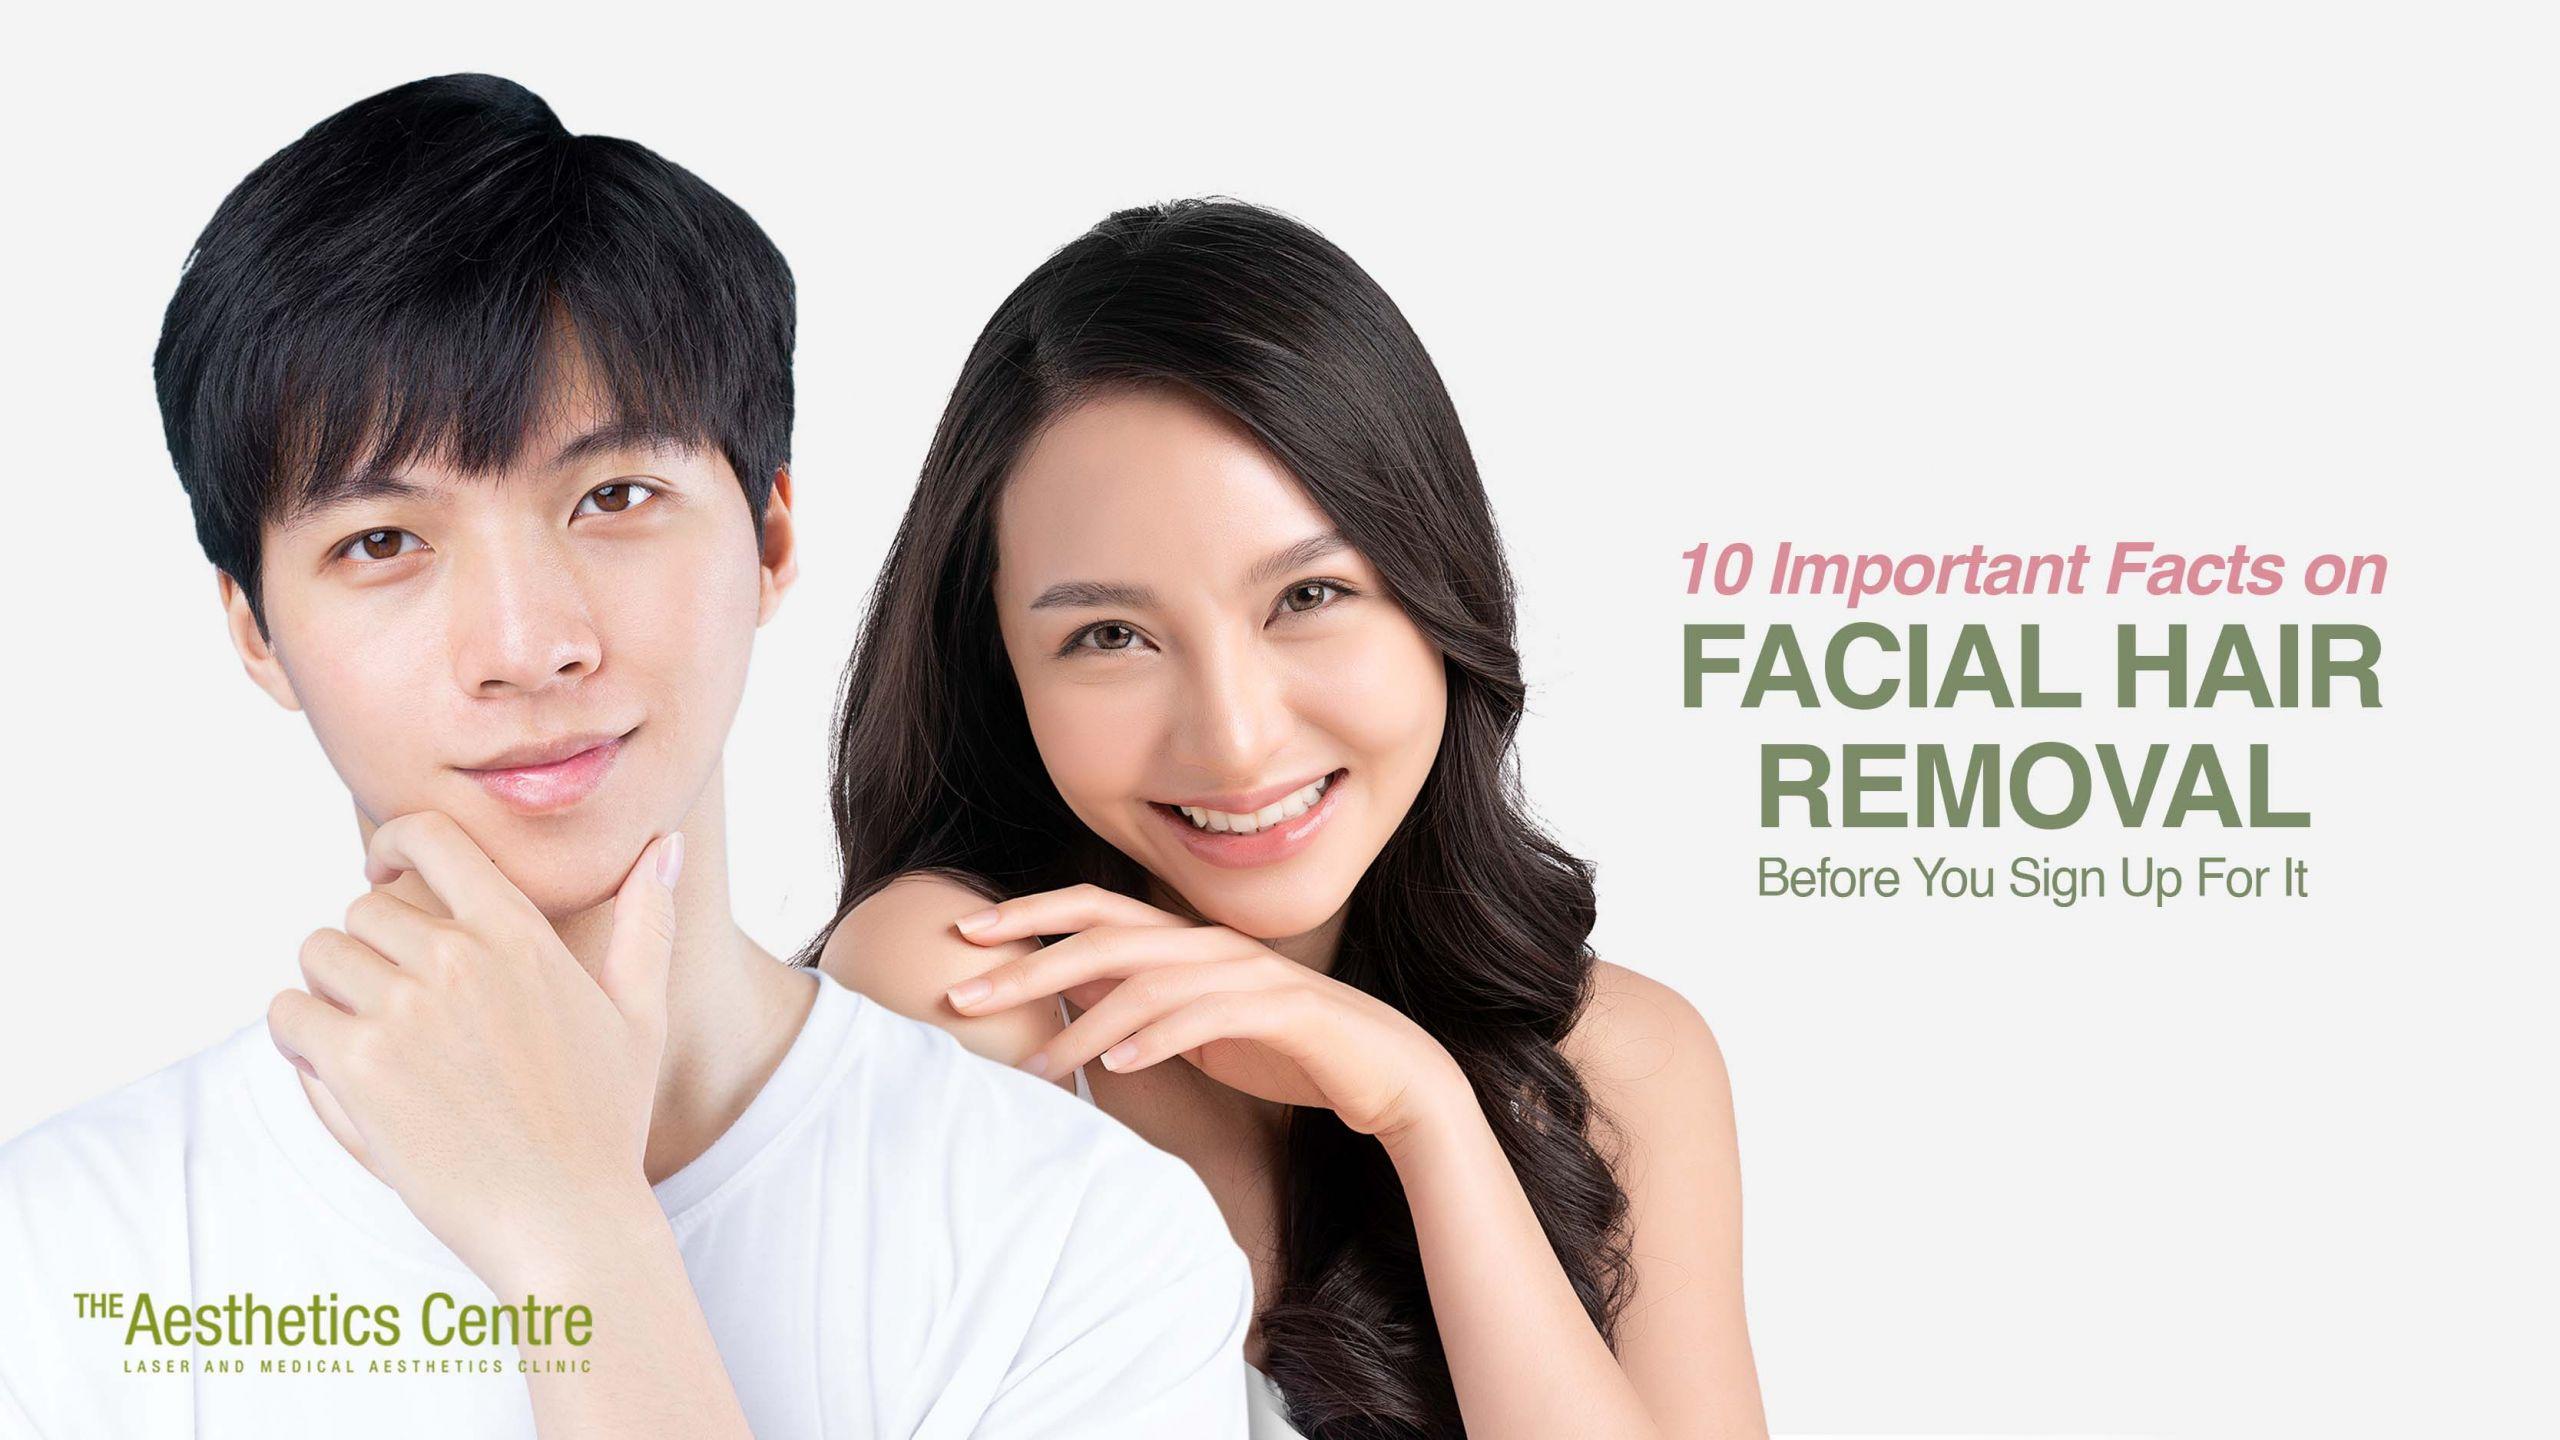 The Aesthetics Centre - Facial Hair Removal Singapore